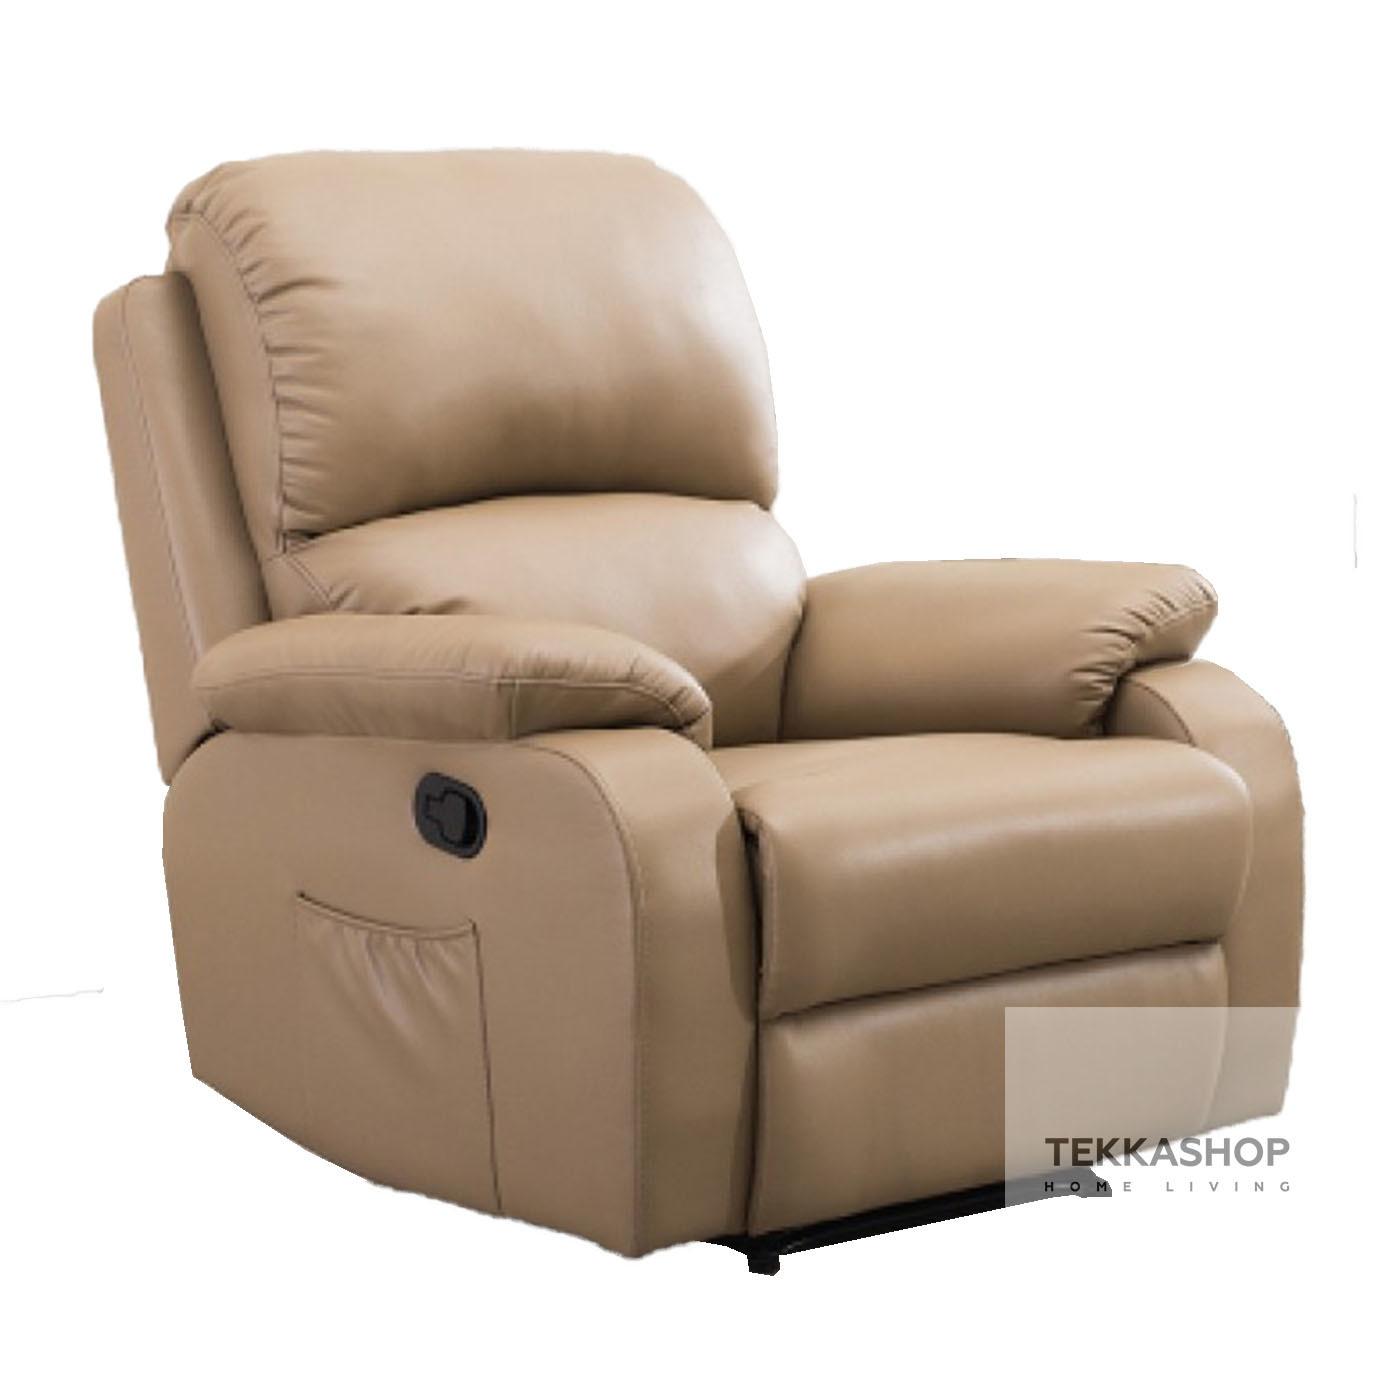 Tekka Gdss1760br Single Seater